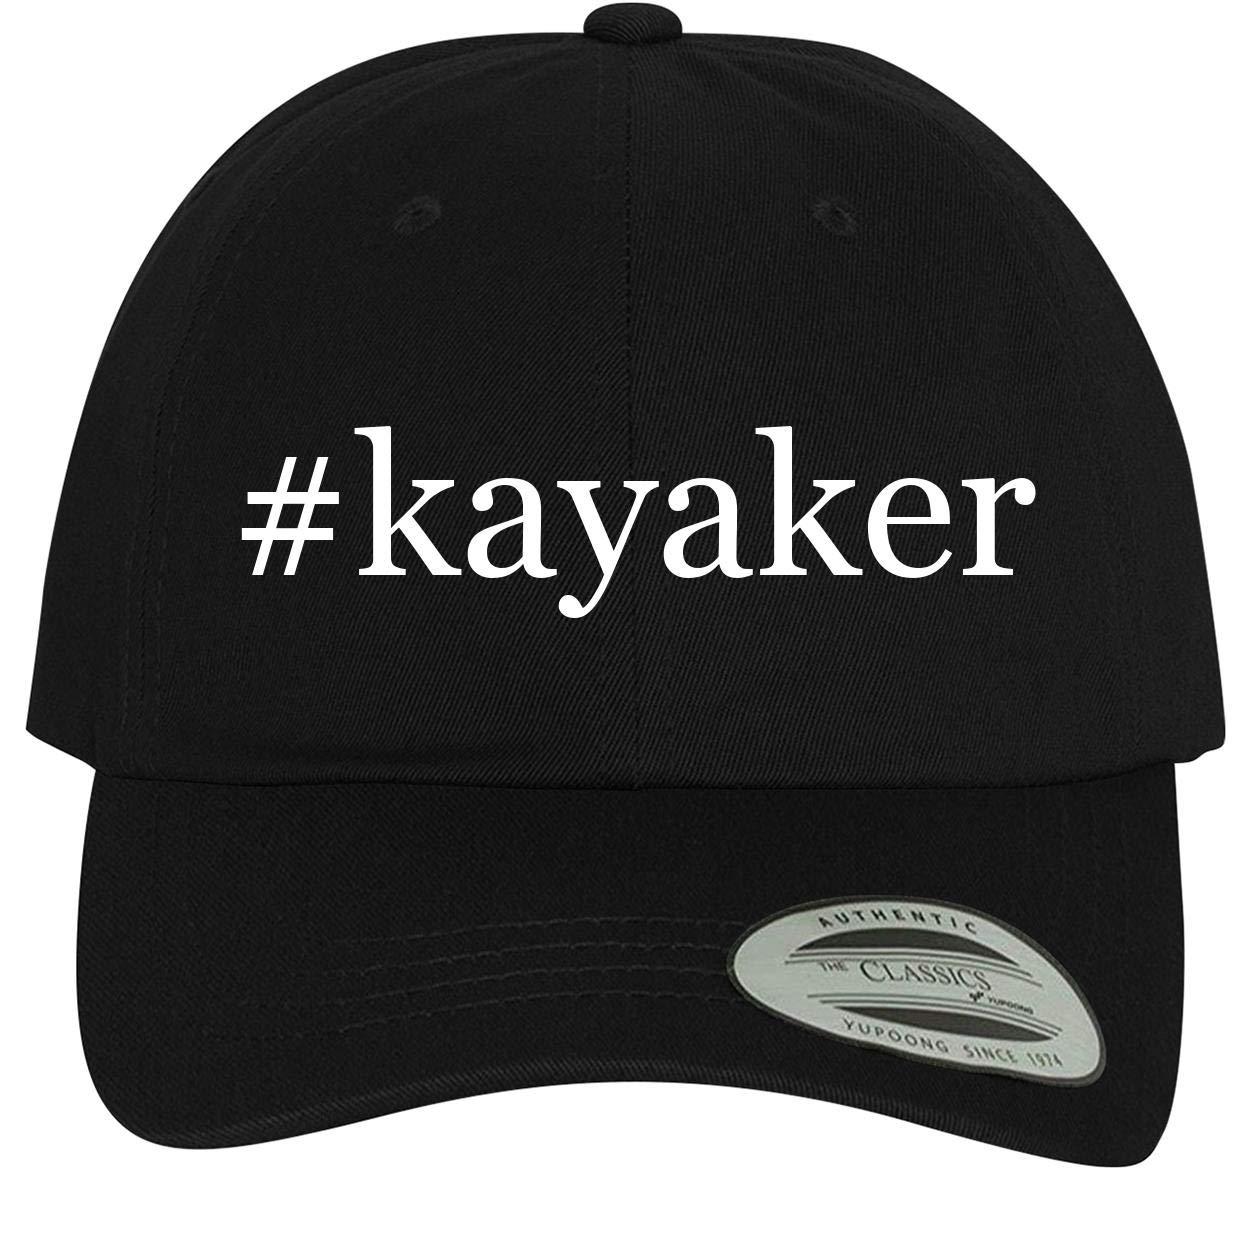 BH Cool Designs #Kayaker Comfortable Dad Hat Baseball Cap